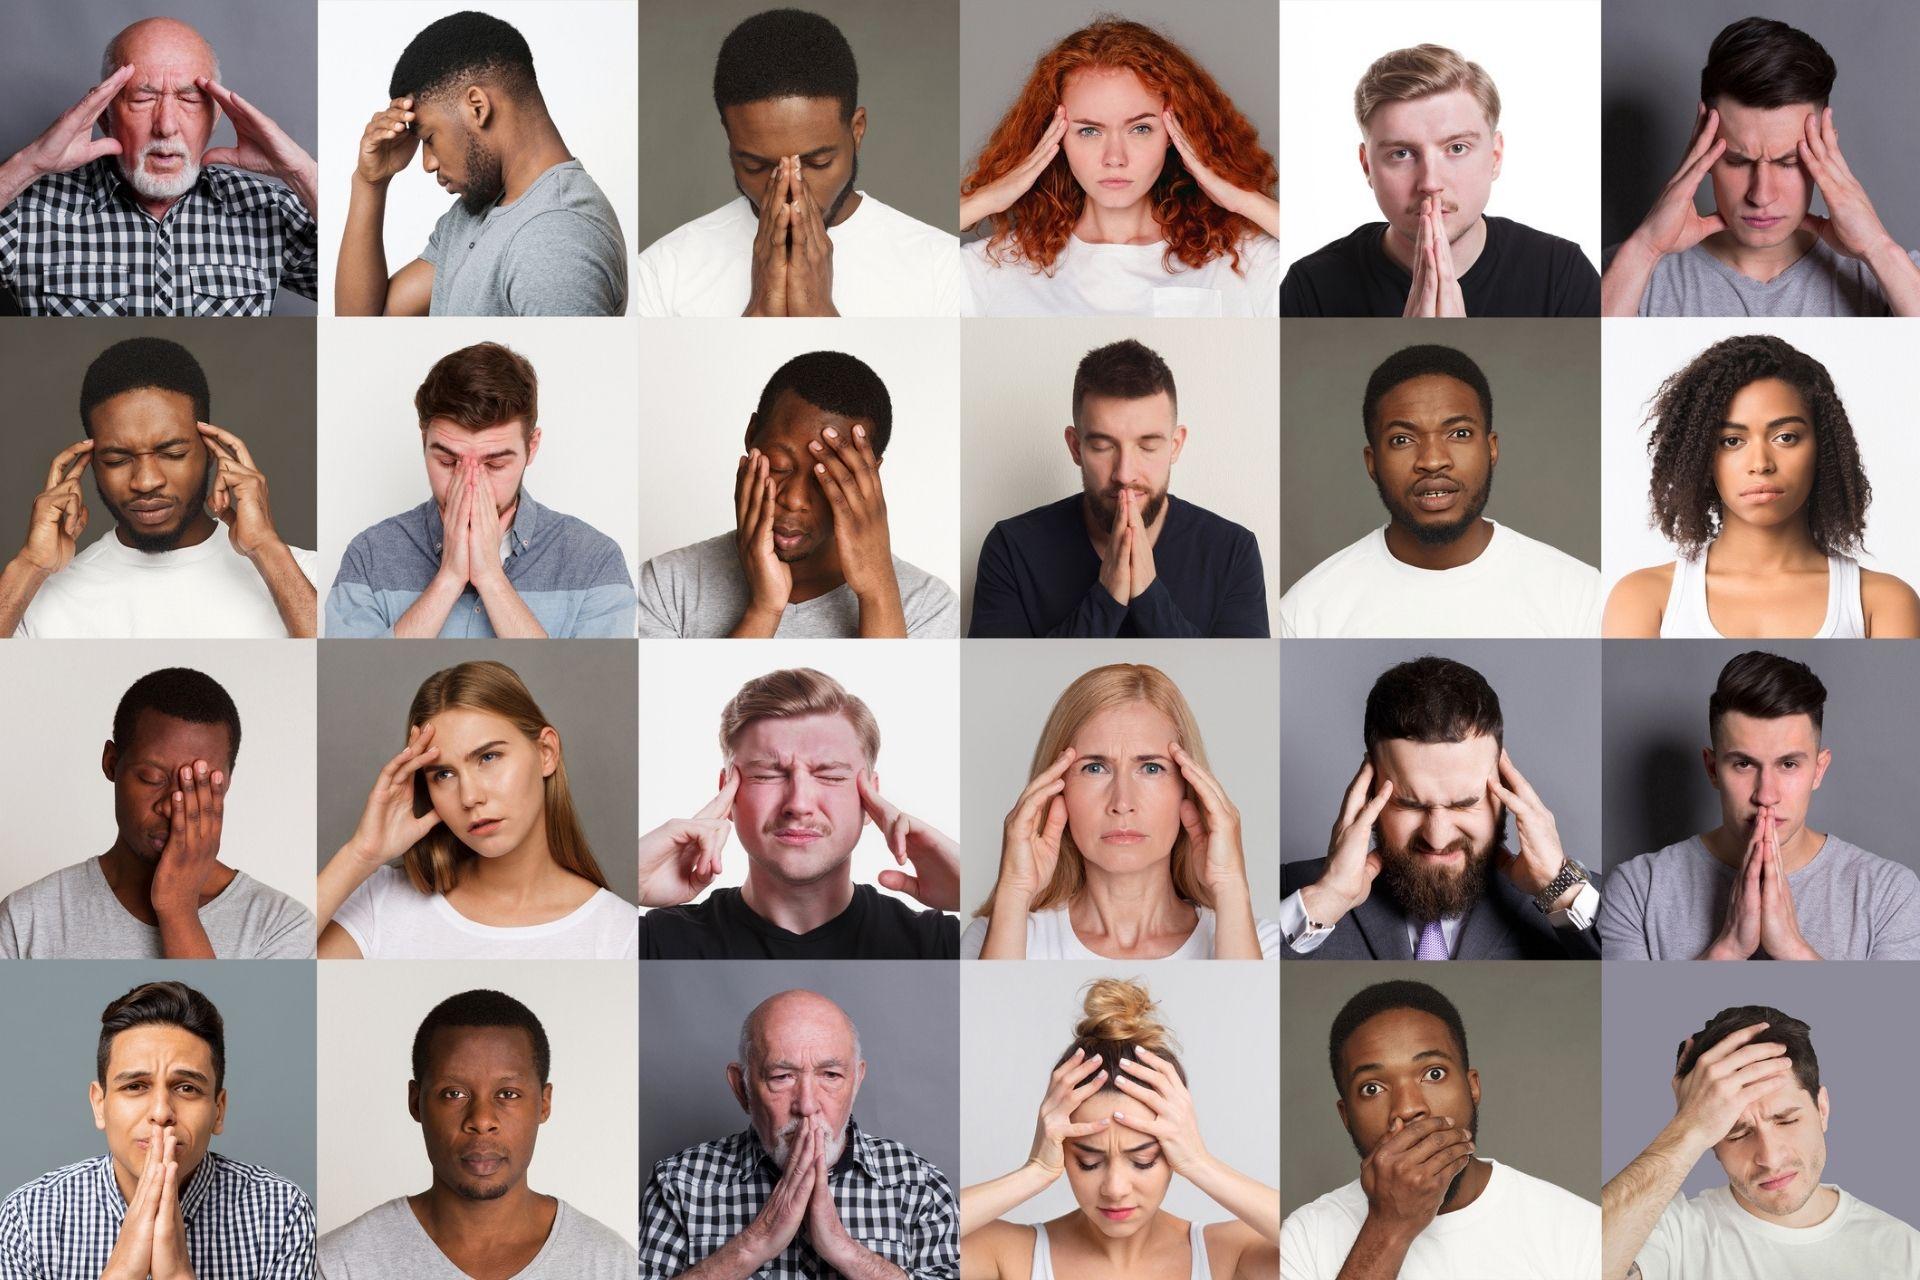 Group of people displaying burnout